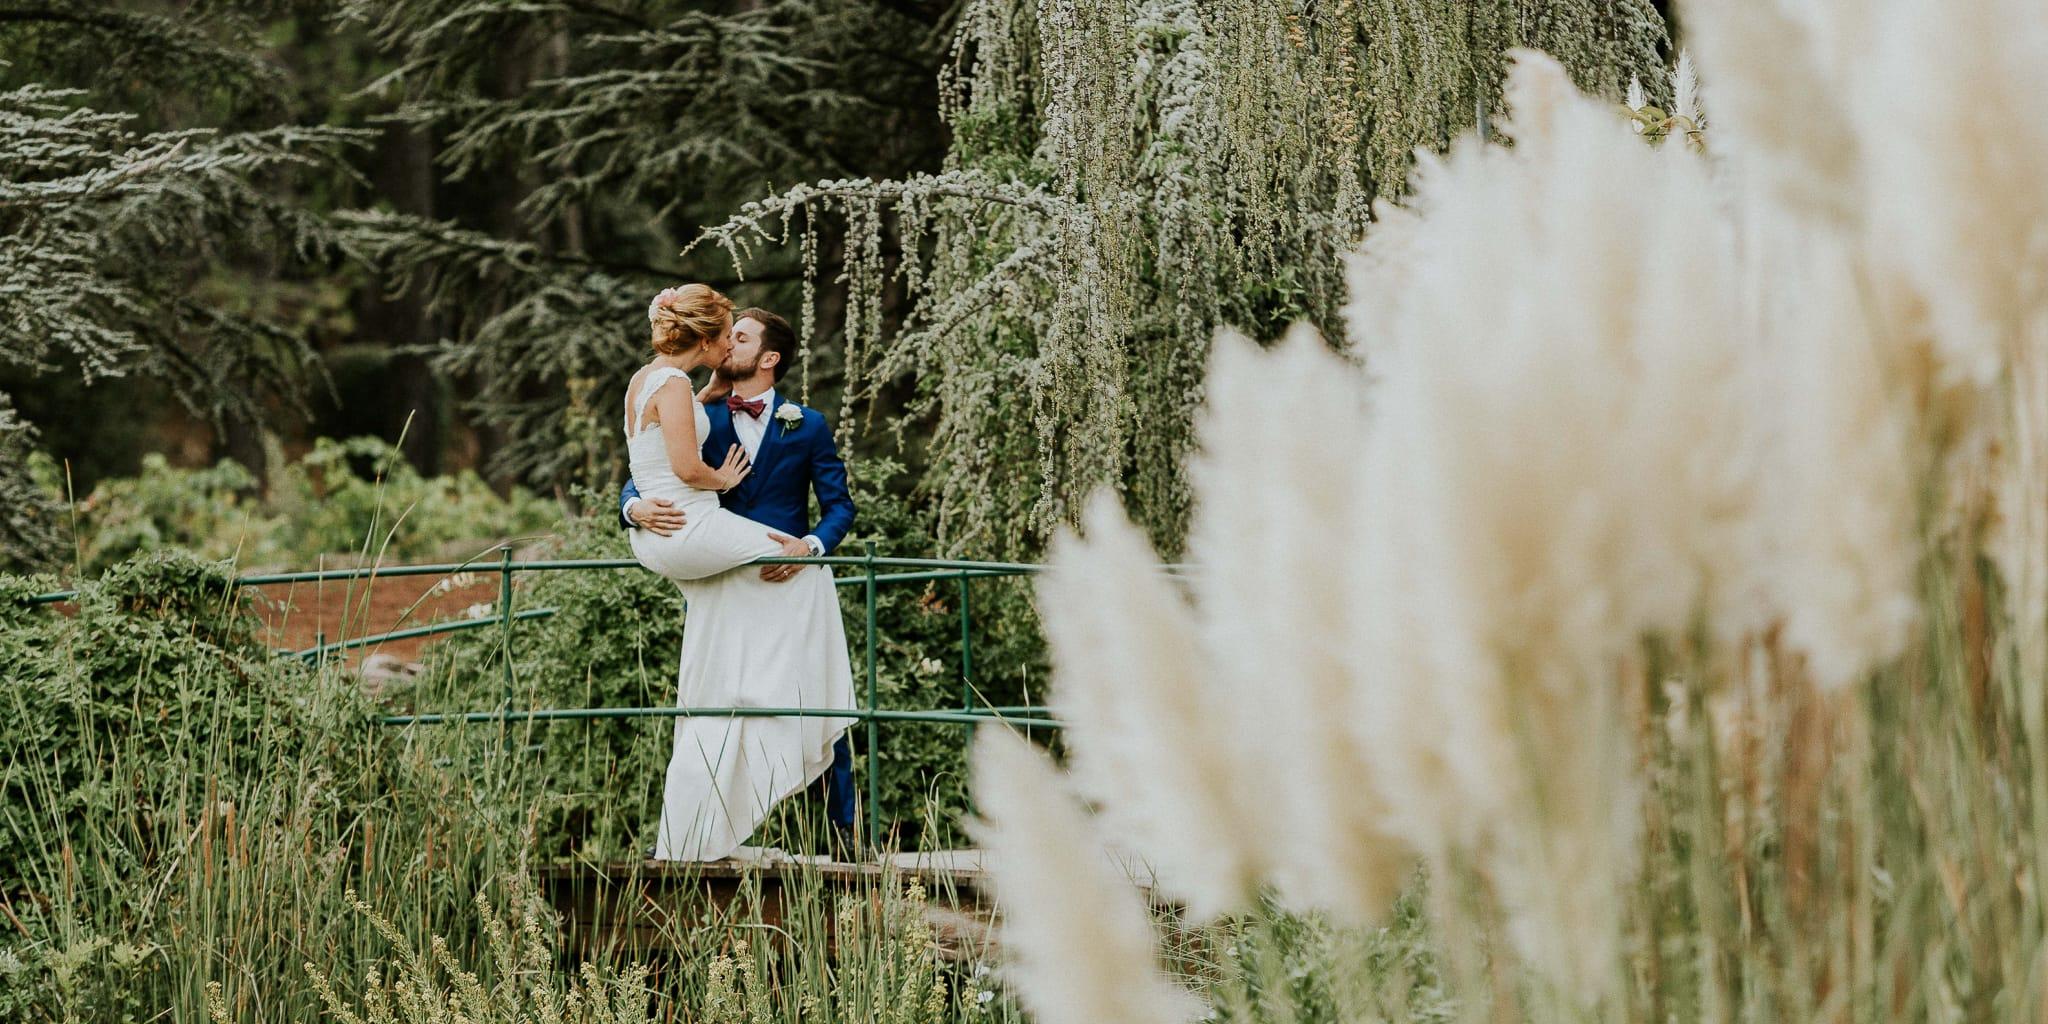 Costi-Moiceanu-Photographer-CM-Photography-Wedding-Mariage-French-Riviera-Cote-D-Azur-Alpes-Maritimes-Weding-Album-Design-15